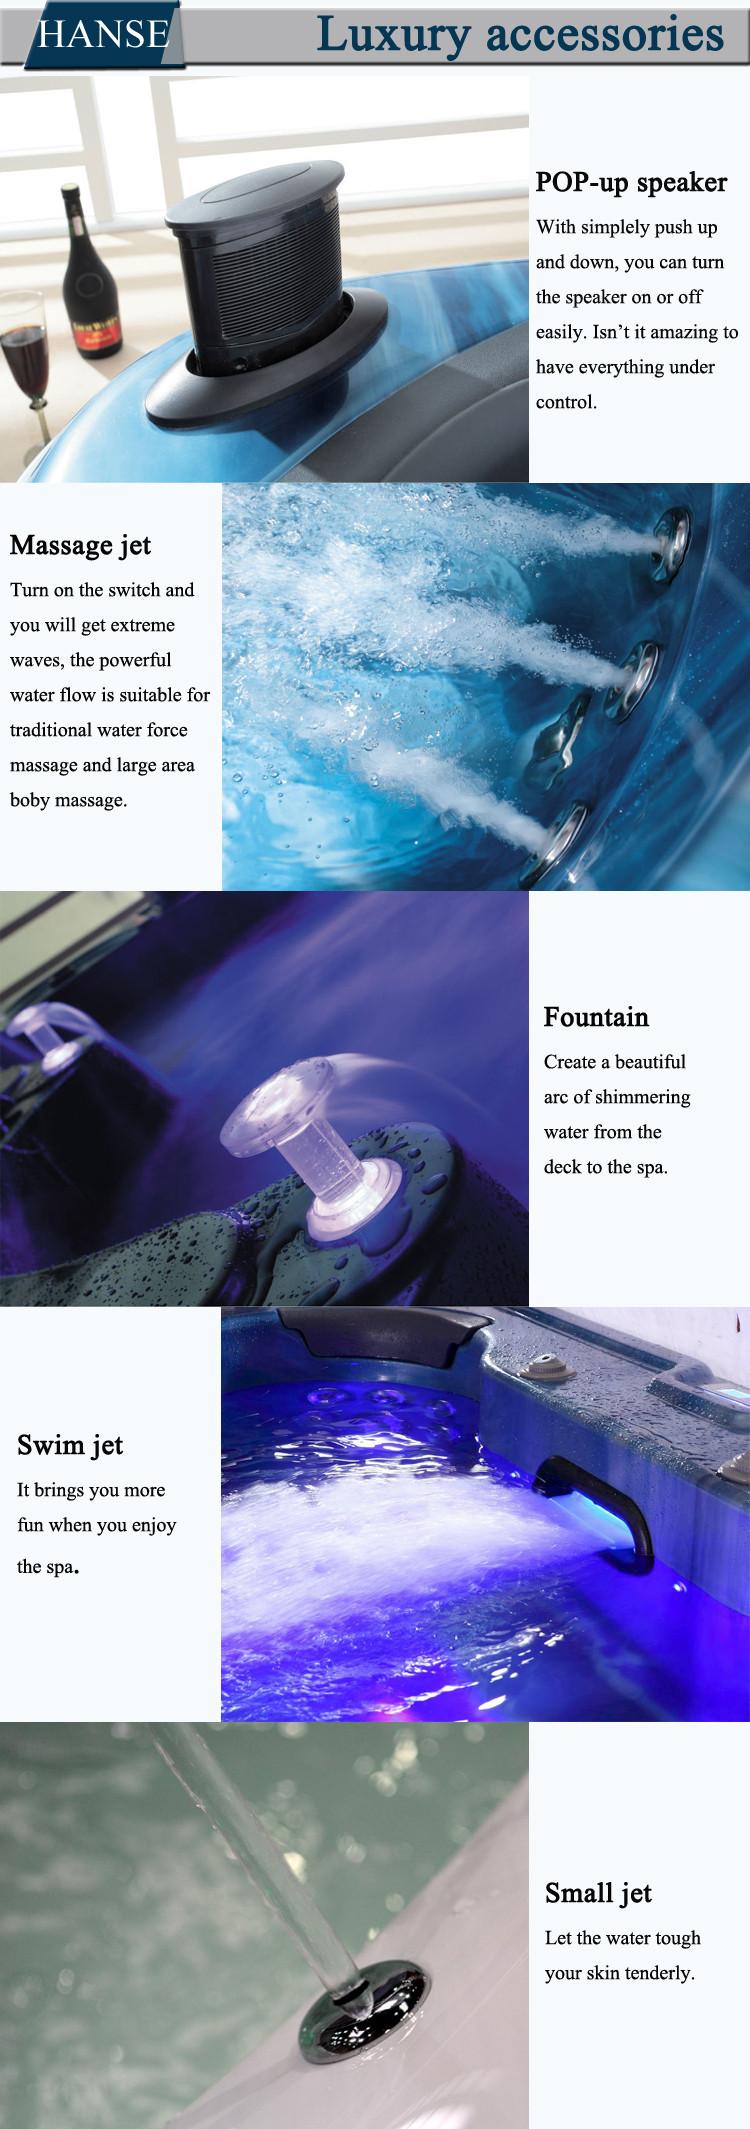 Hs-098 Tokyo Hot Tub/balboa Spa Prices/mini Indoor Hot Tub - Buy ...